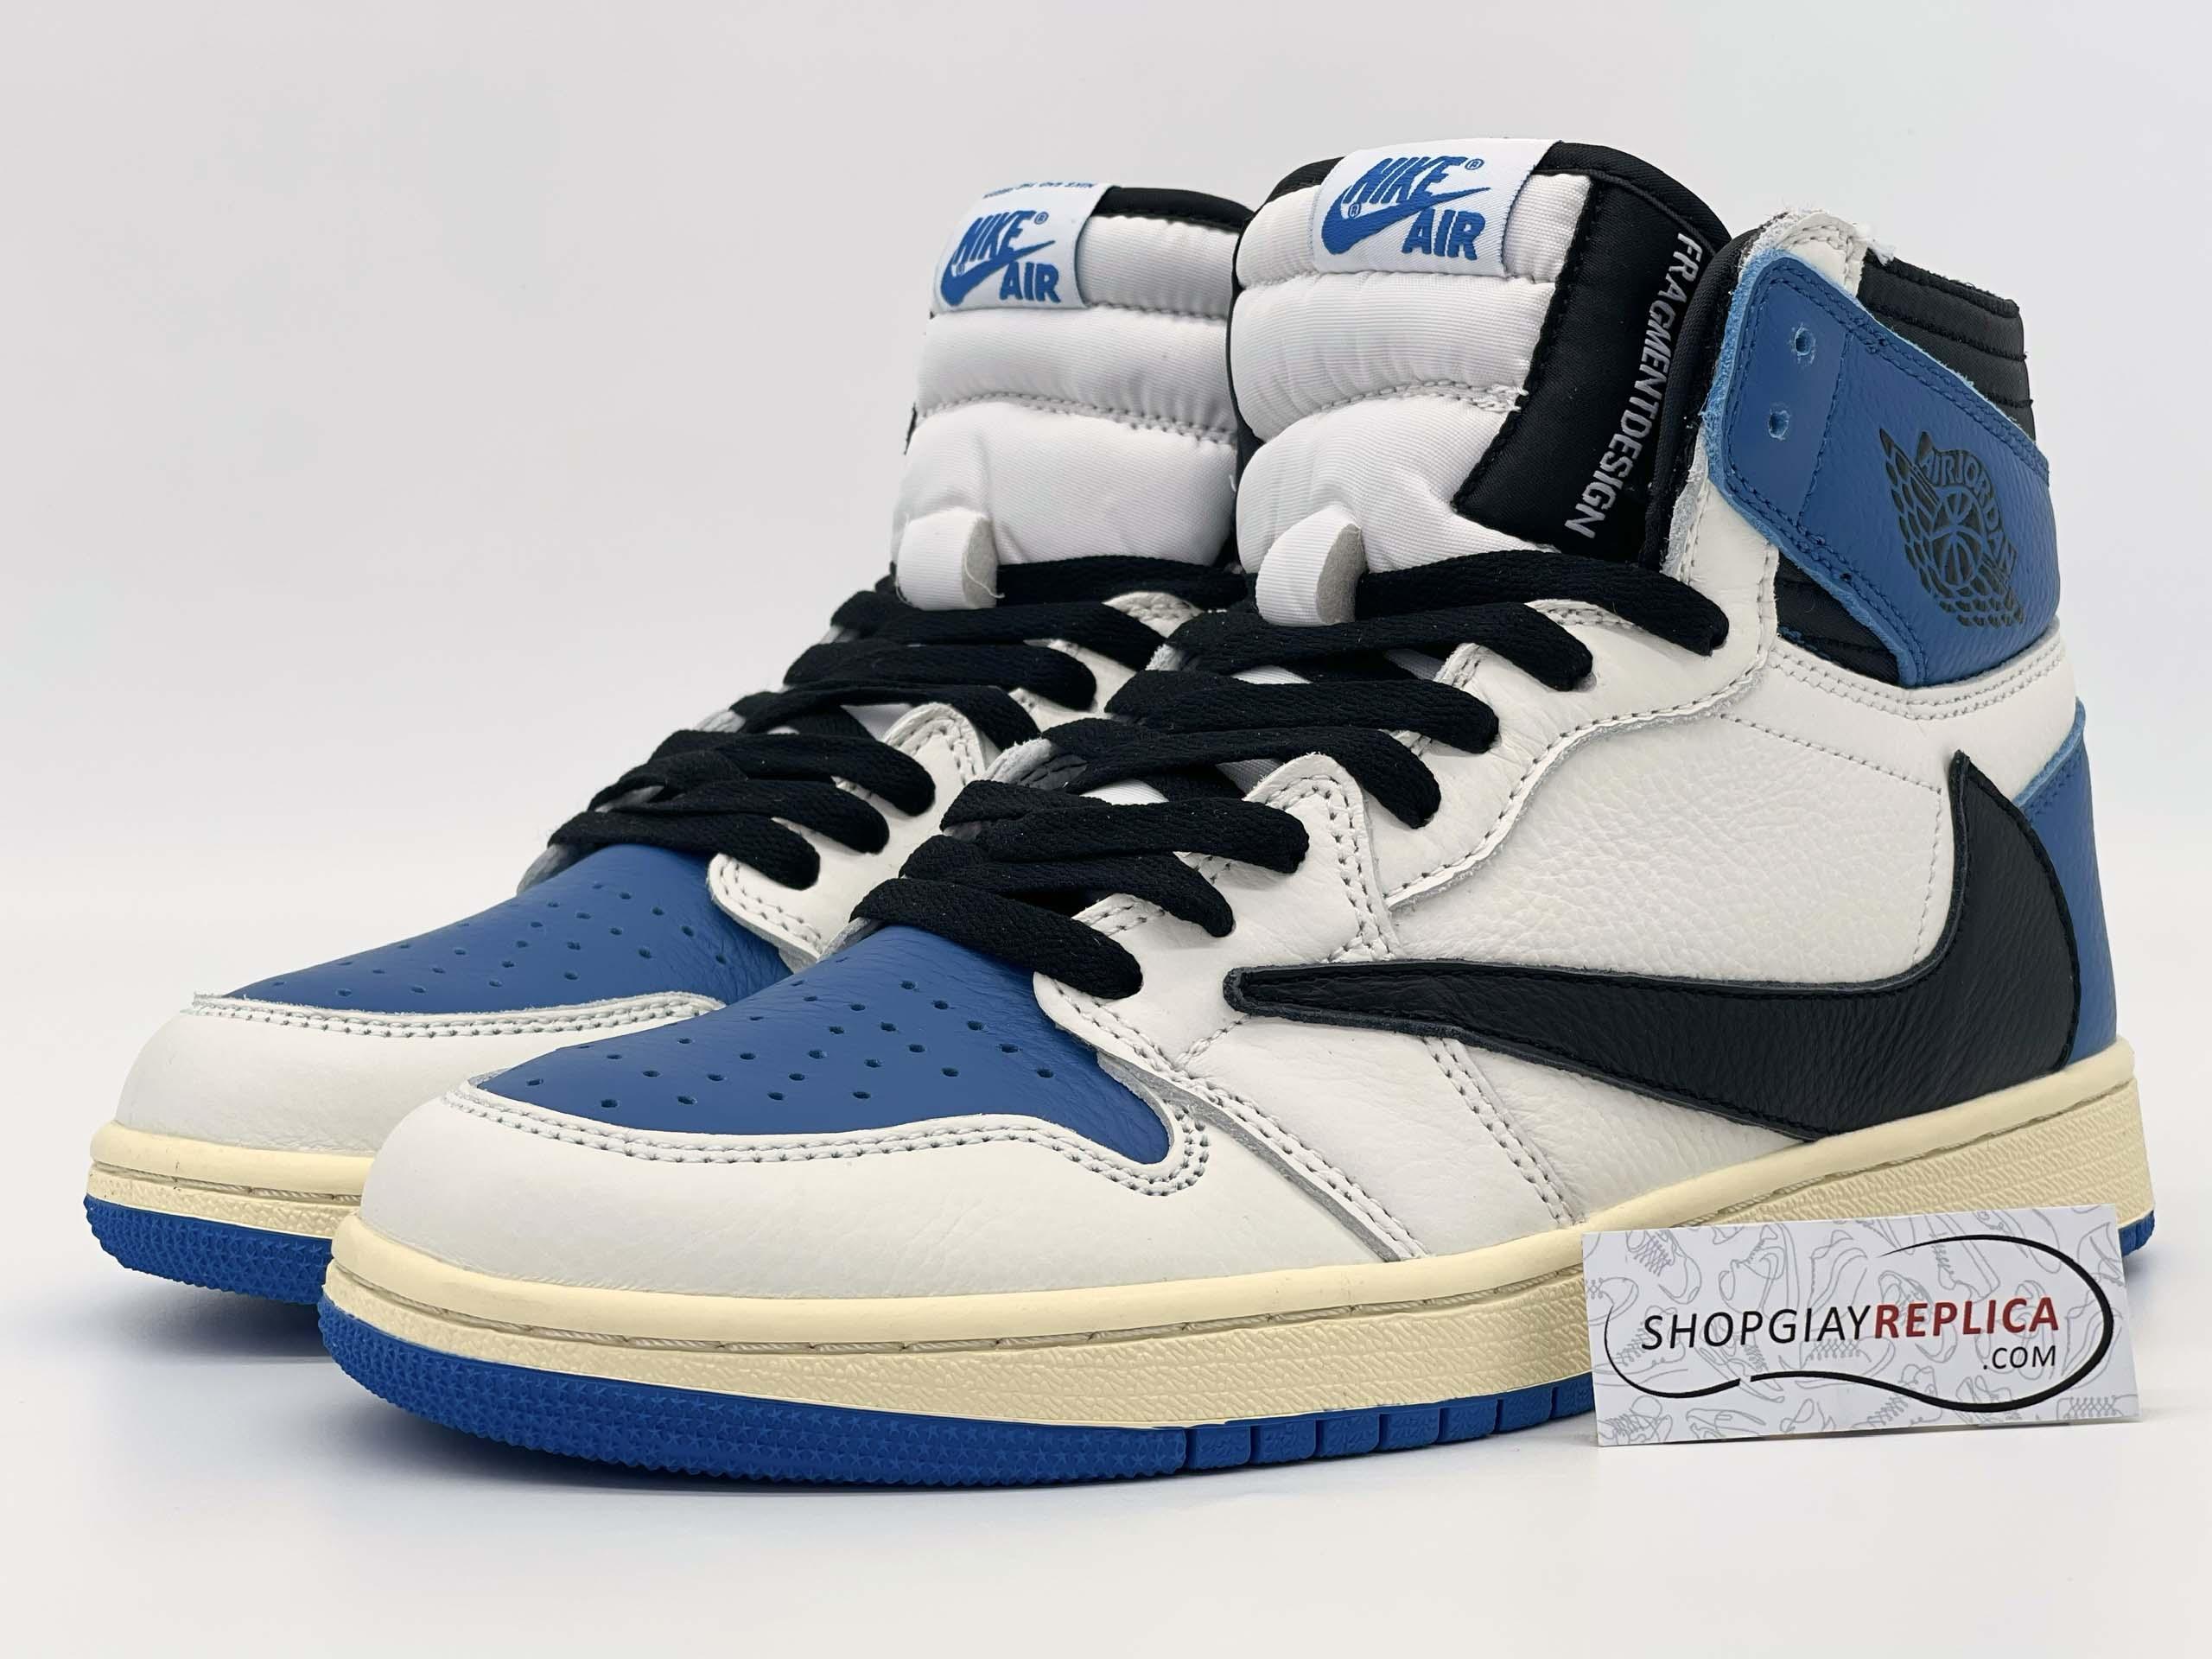 Giày Nike Air Jordan 1 High Travis Scott x Fragment 11